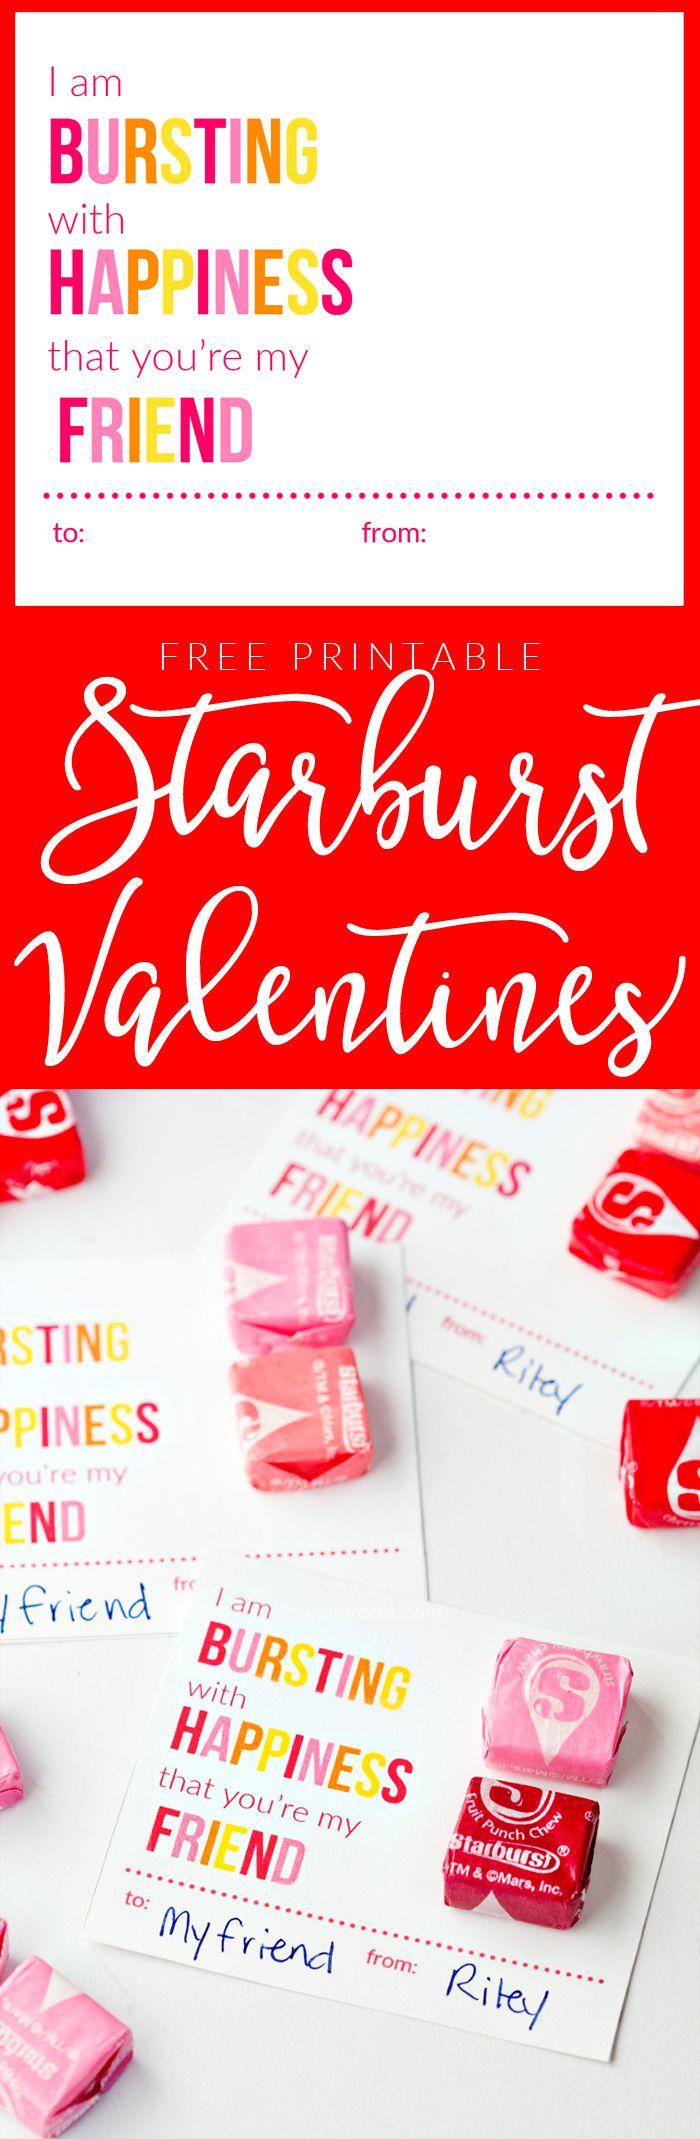 178 Best Valentine S Day Printables Images On Pinterest Valentine